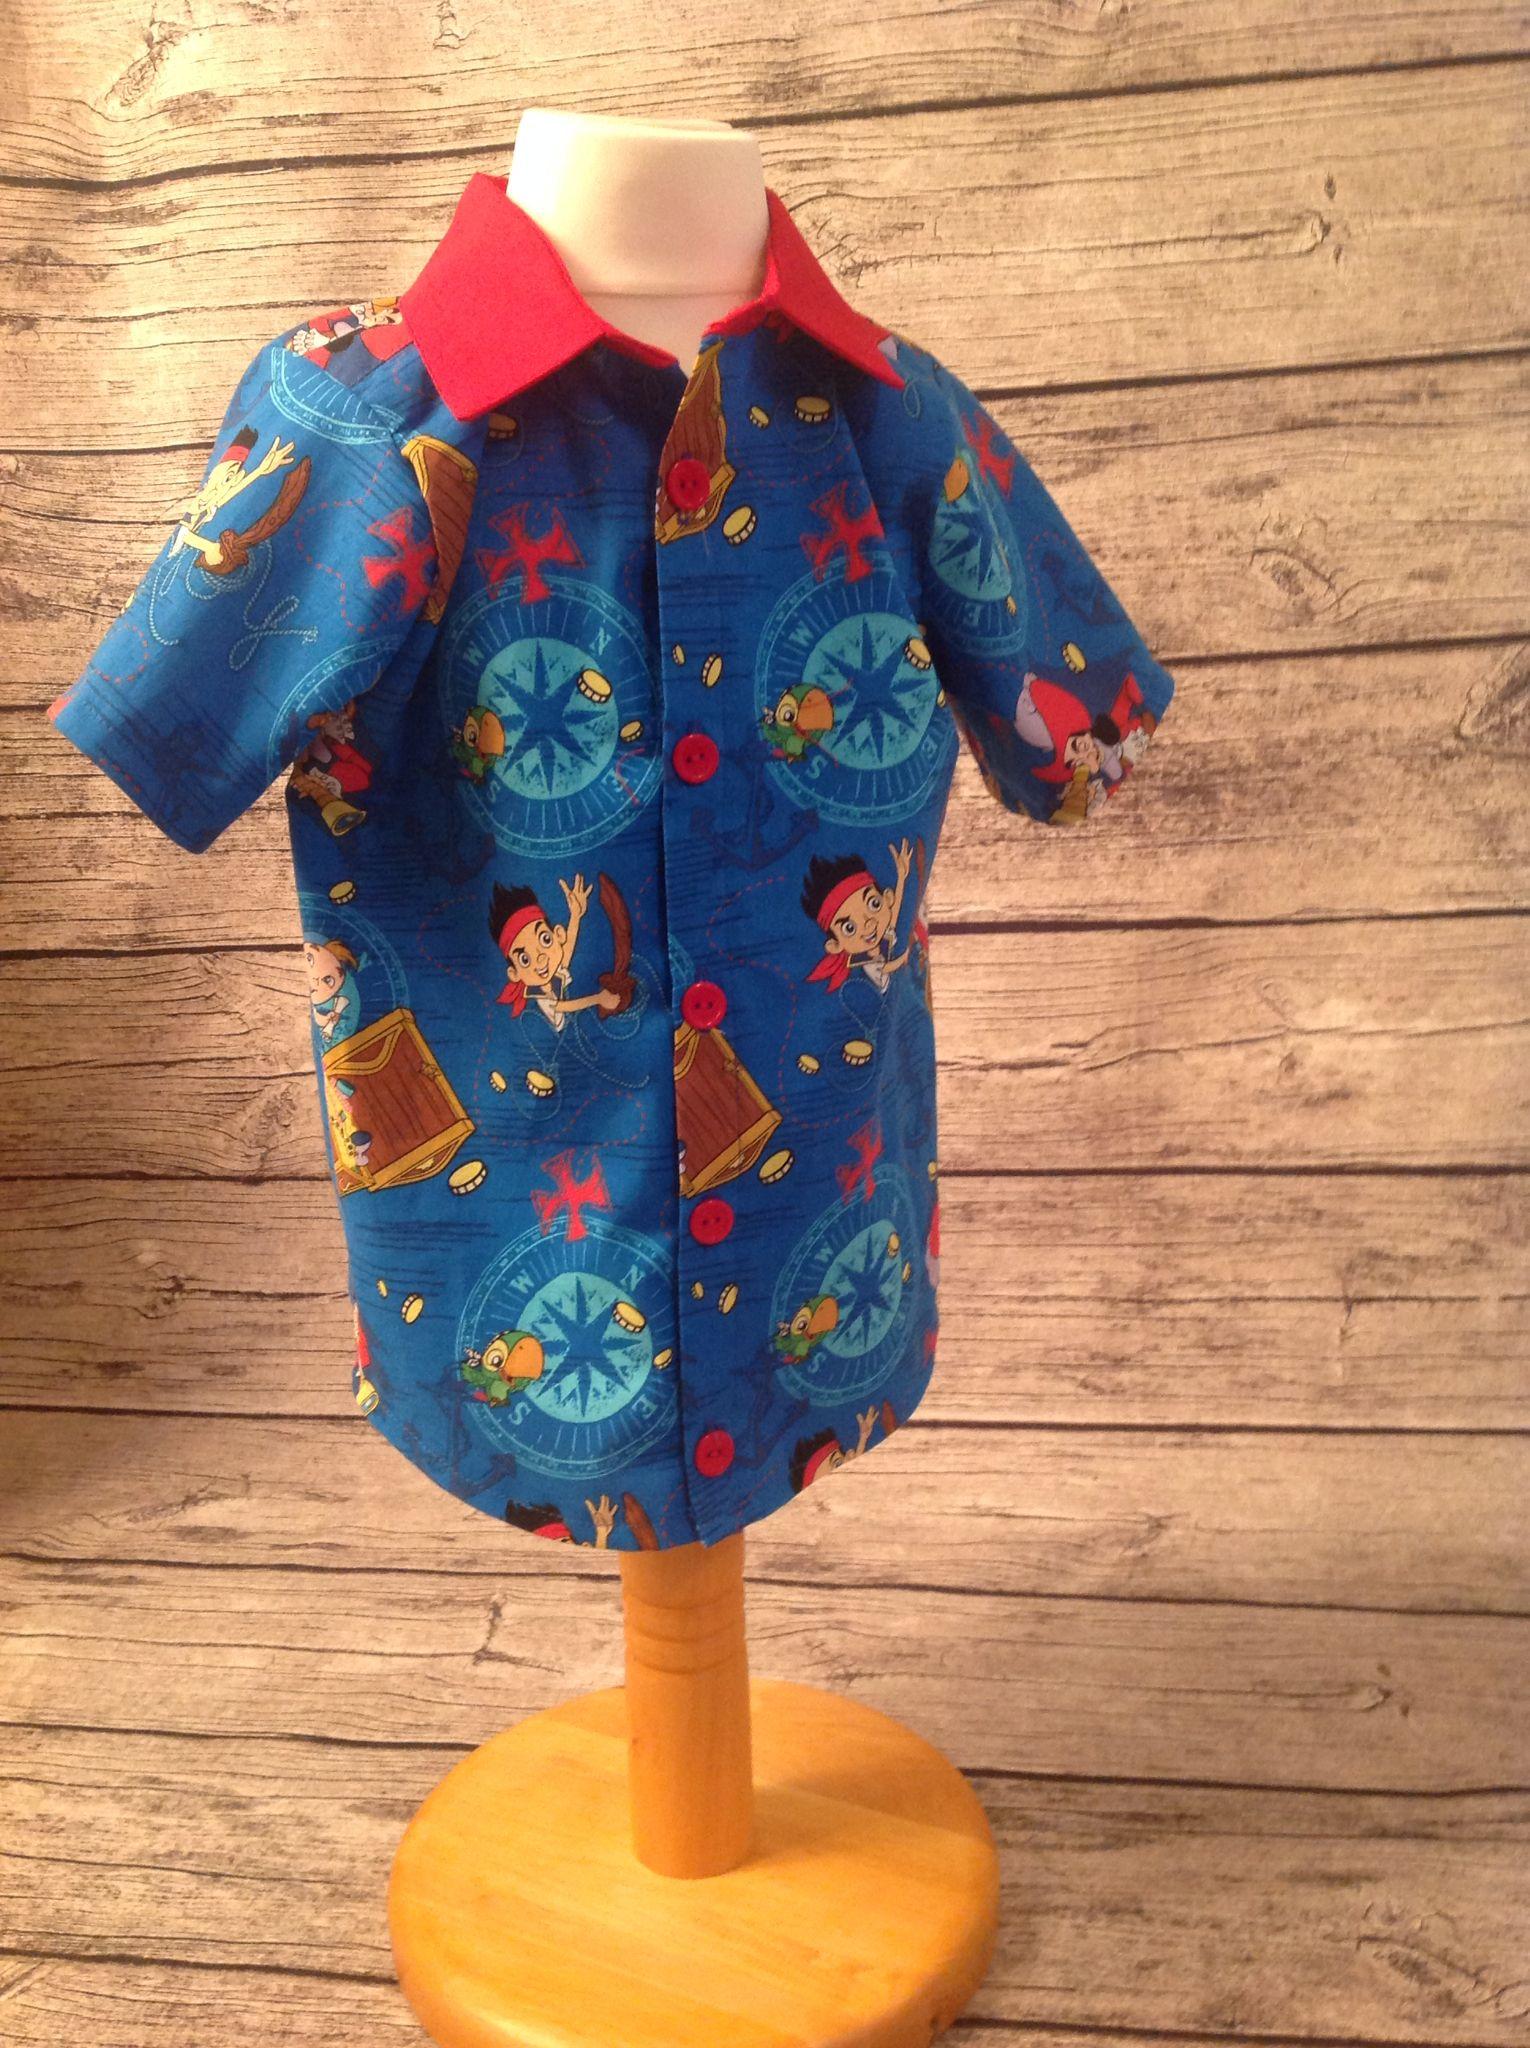 Jake shirt. Made from the Oxford shirt pattern from peekaboo pattern shop.